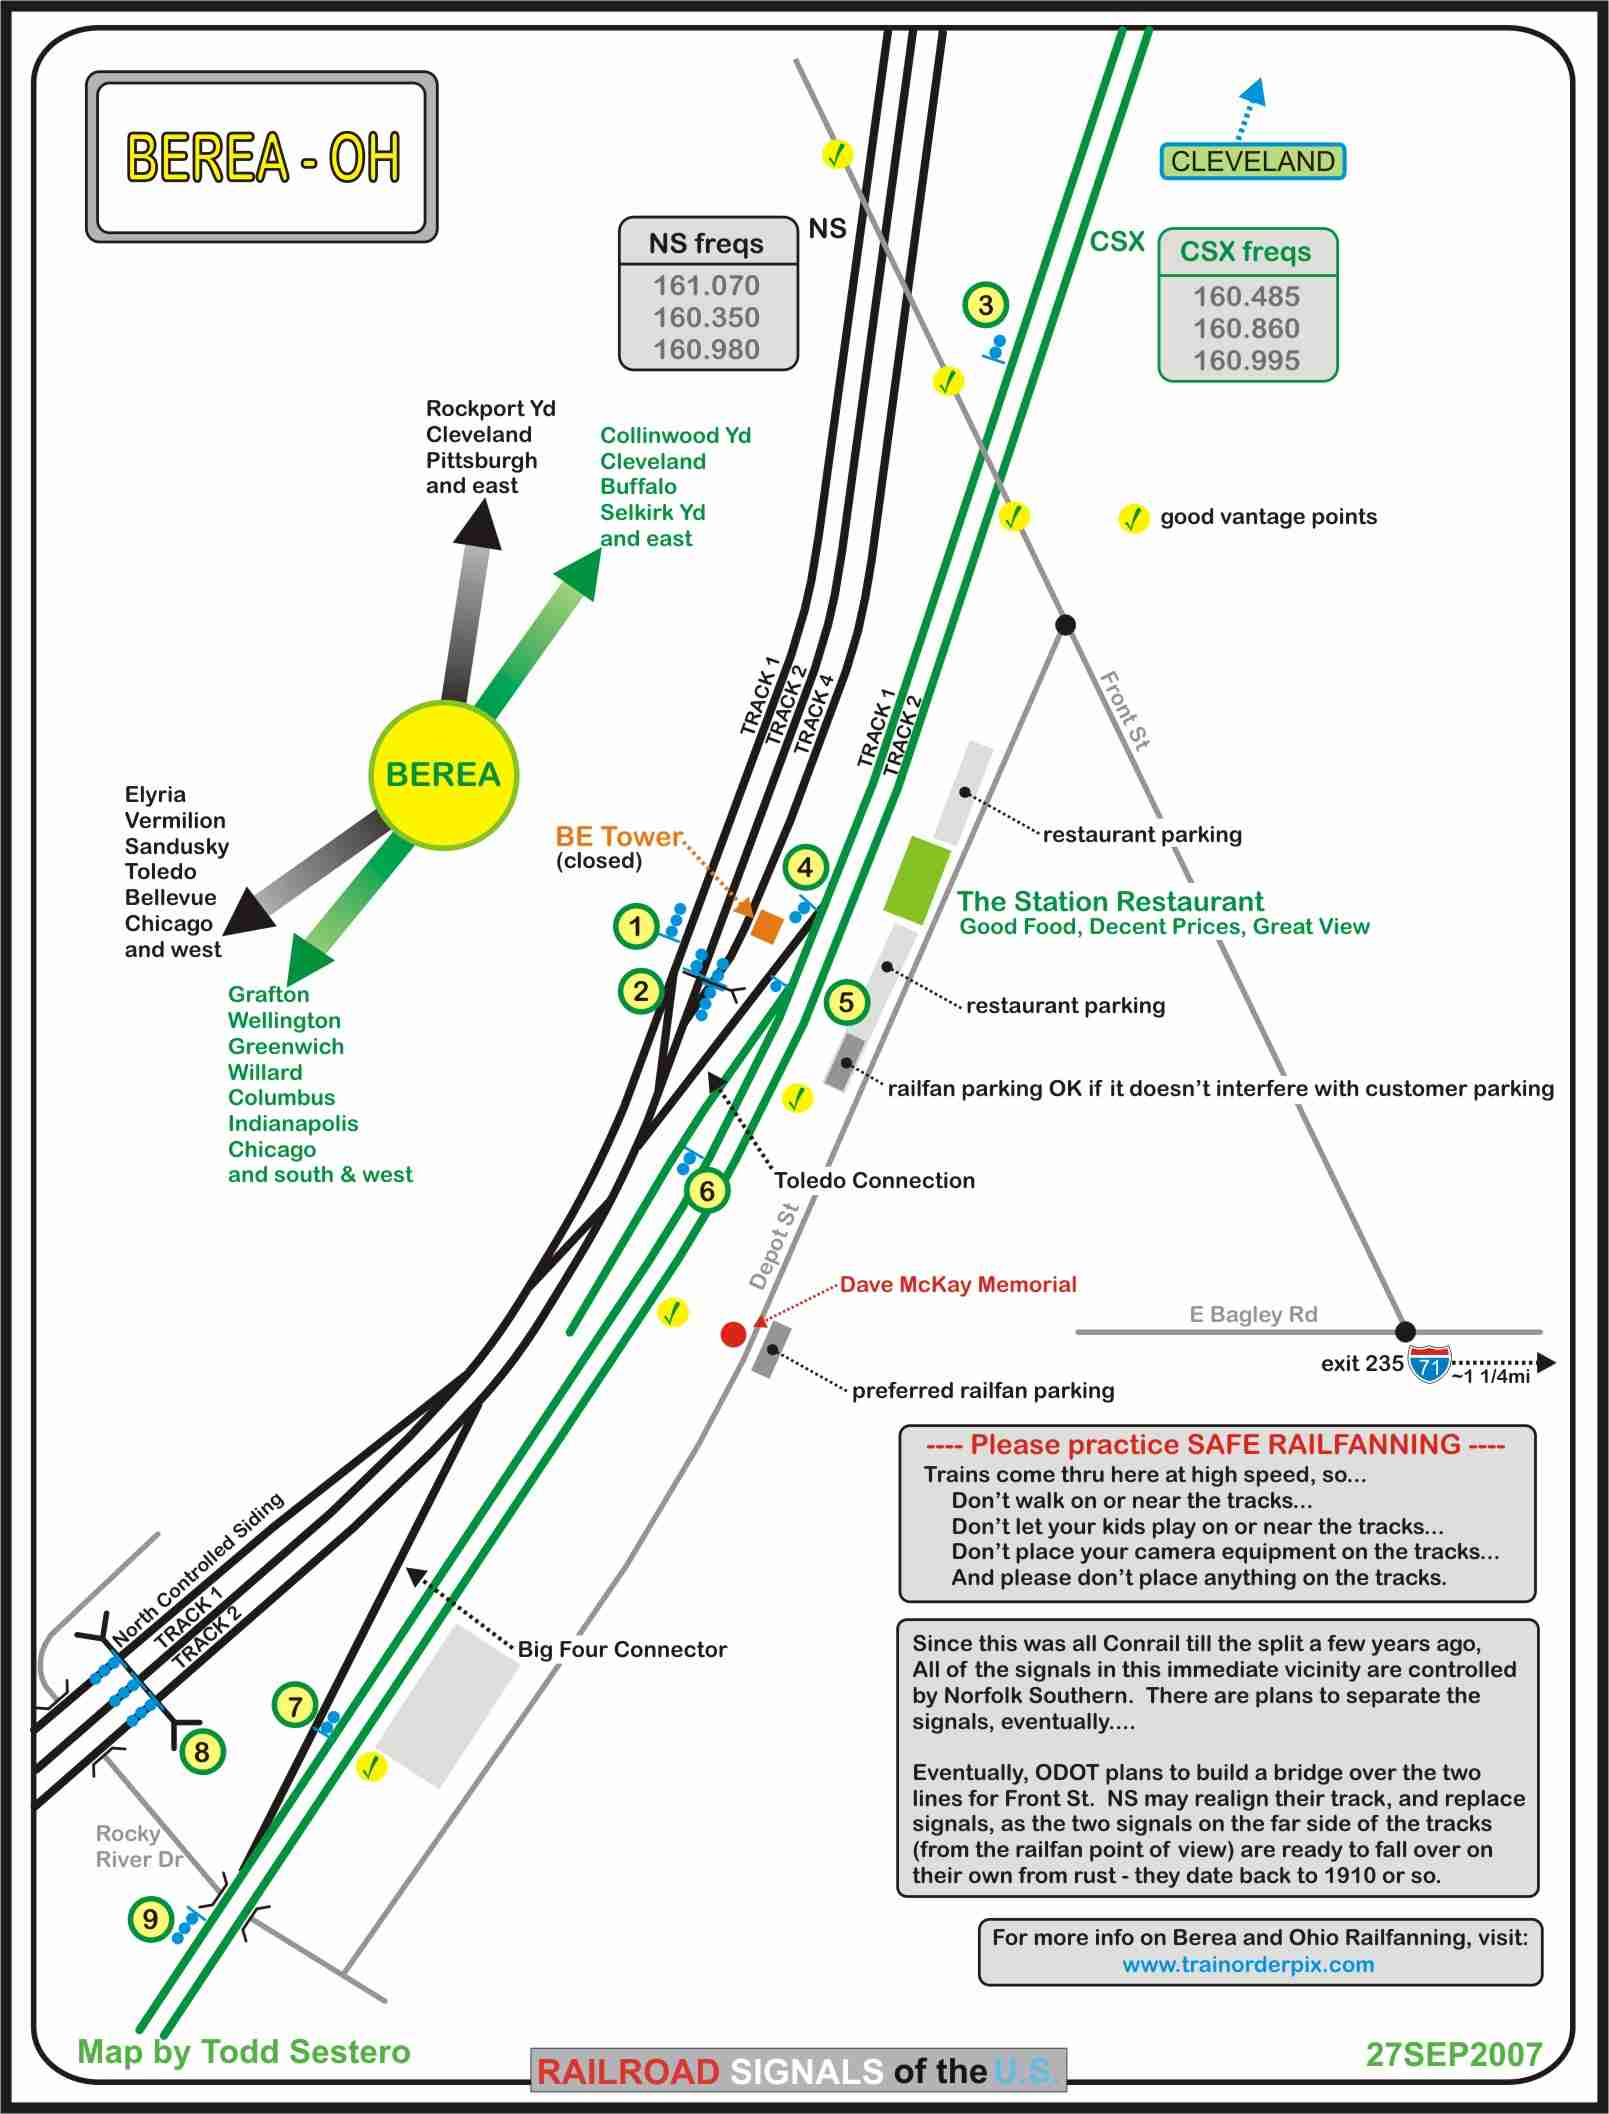 Railfan Guide To Berea Oh